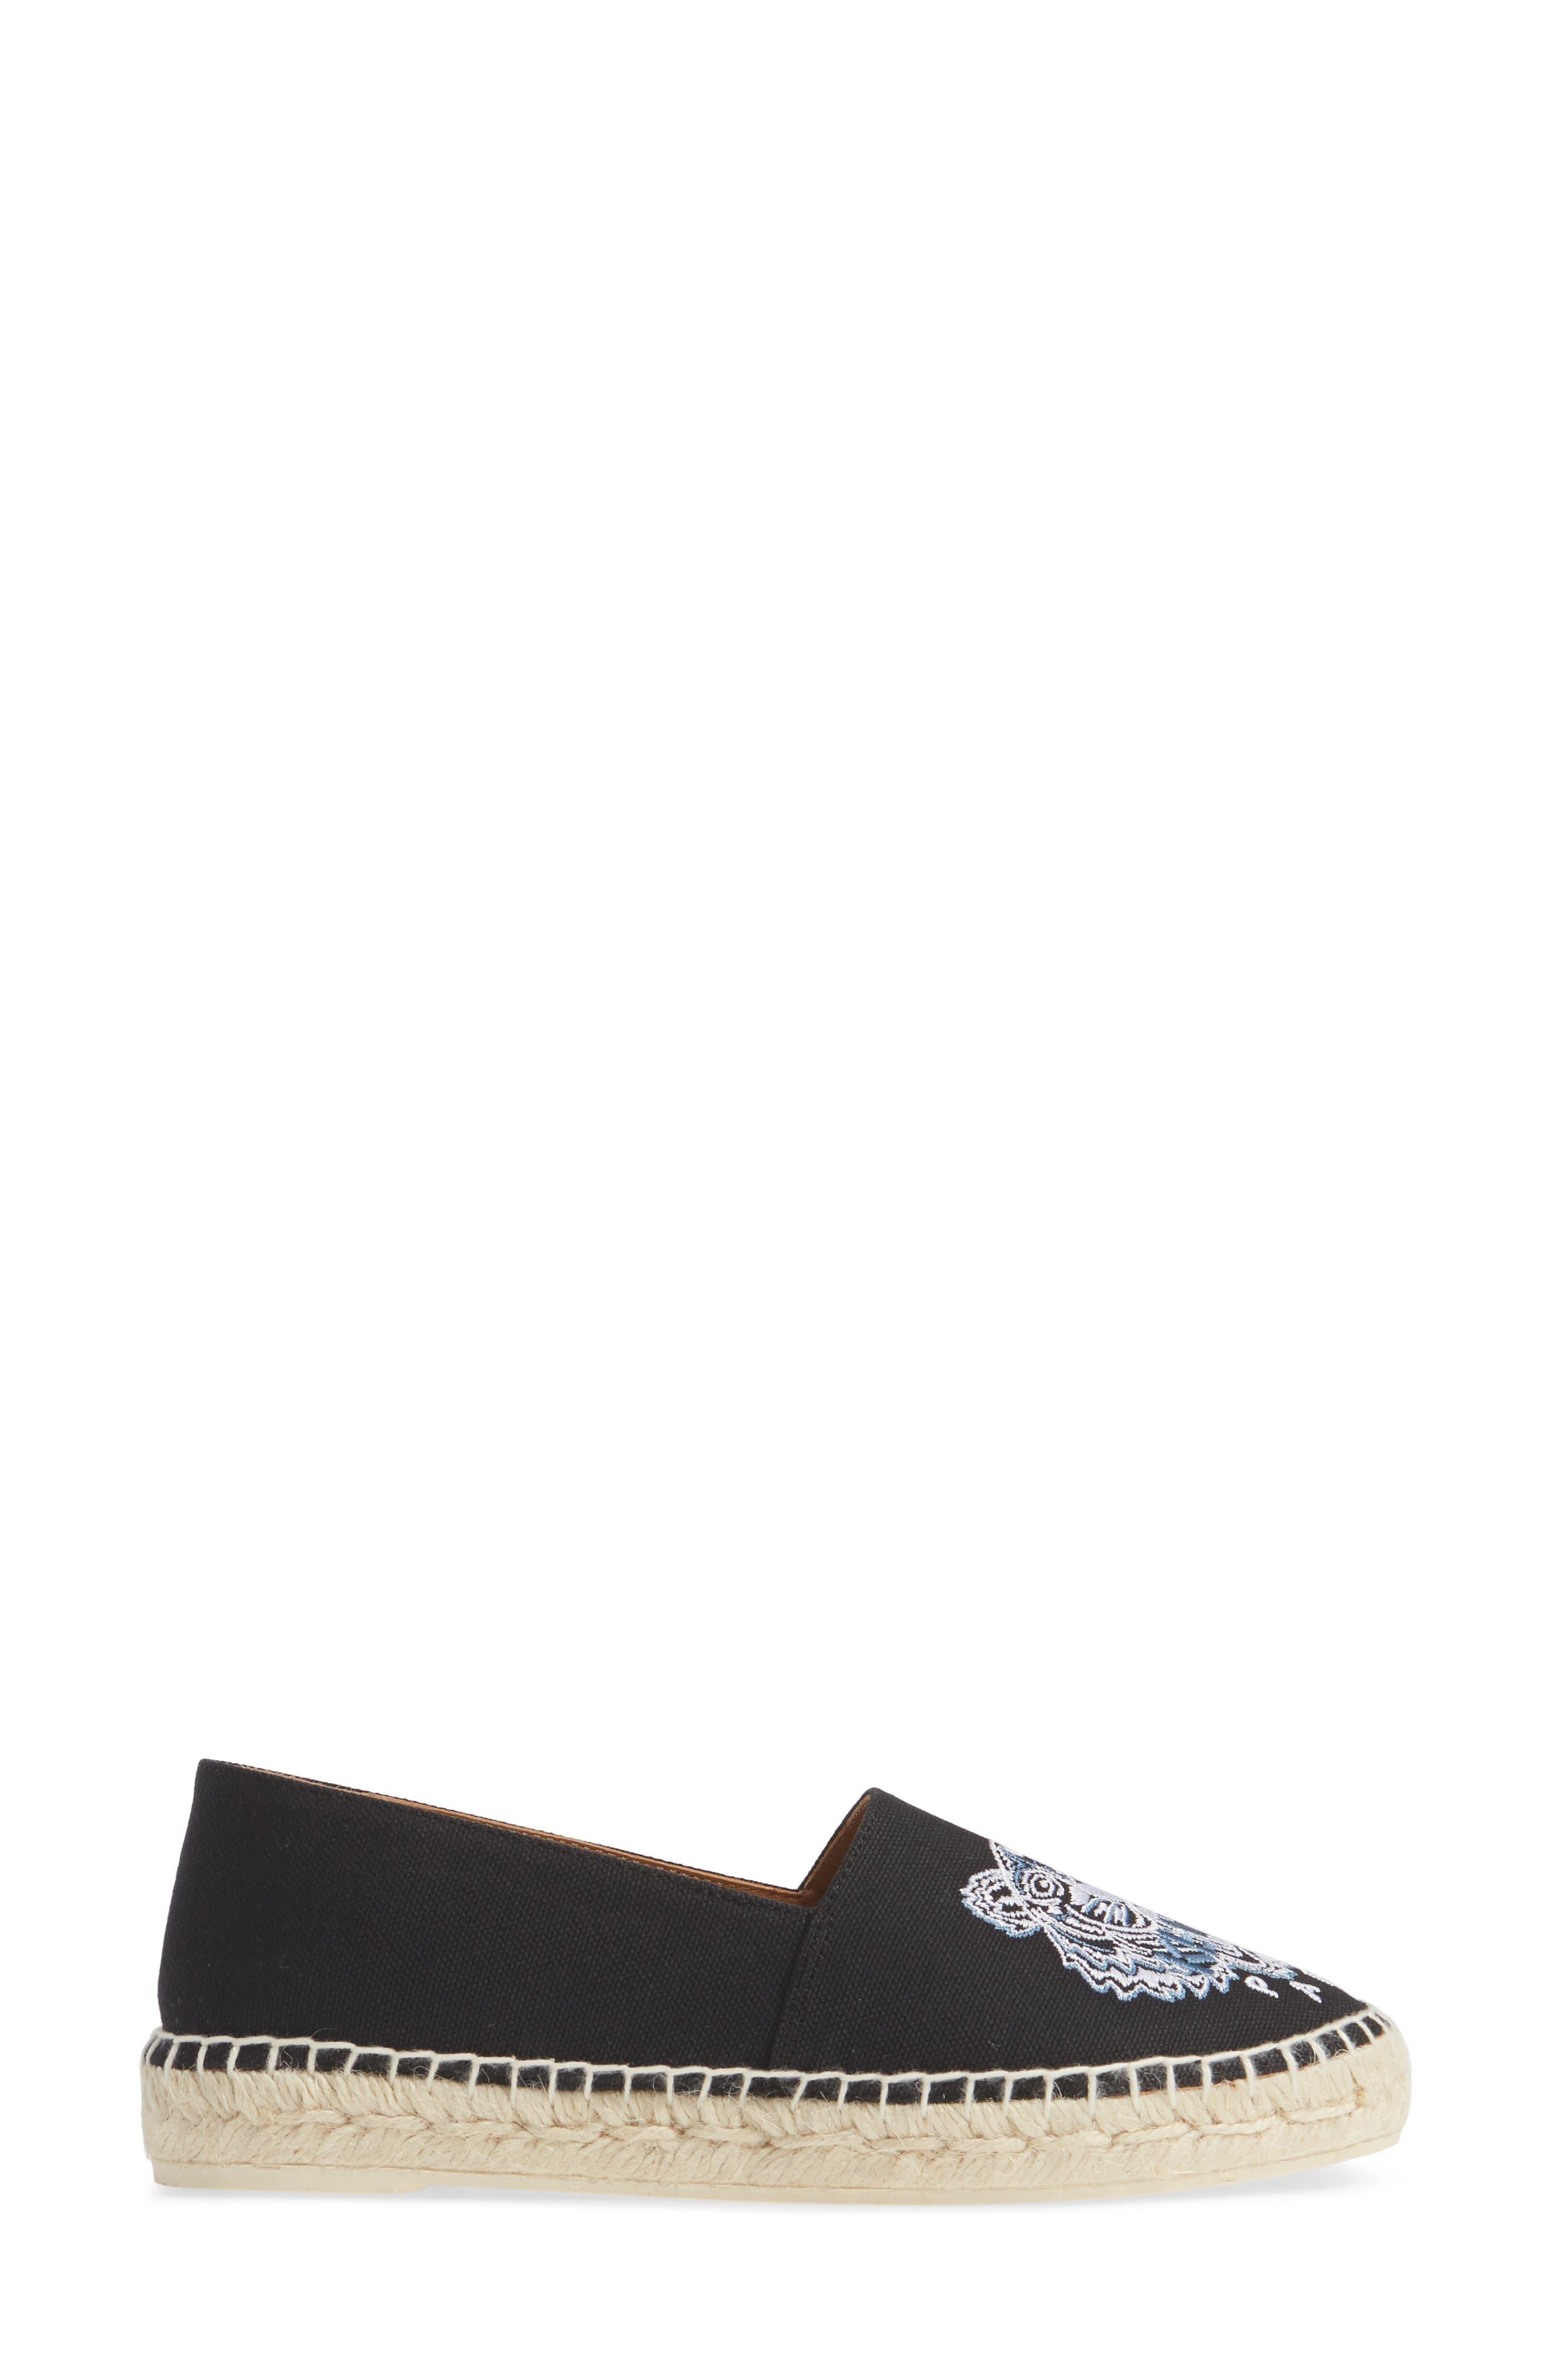 KENZO,                             White Tiger Embroidered Espadrille,                             Alternate thumbnail 3, color,                             BLACK